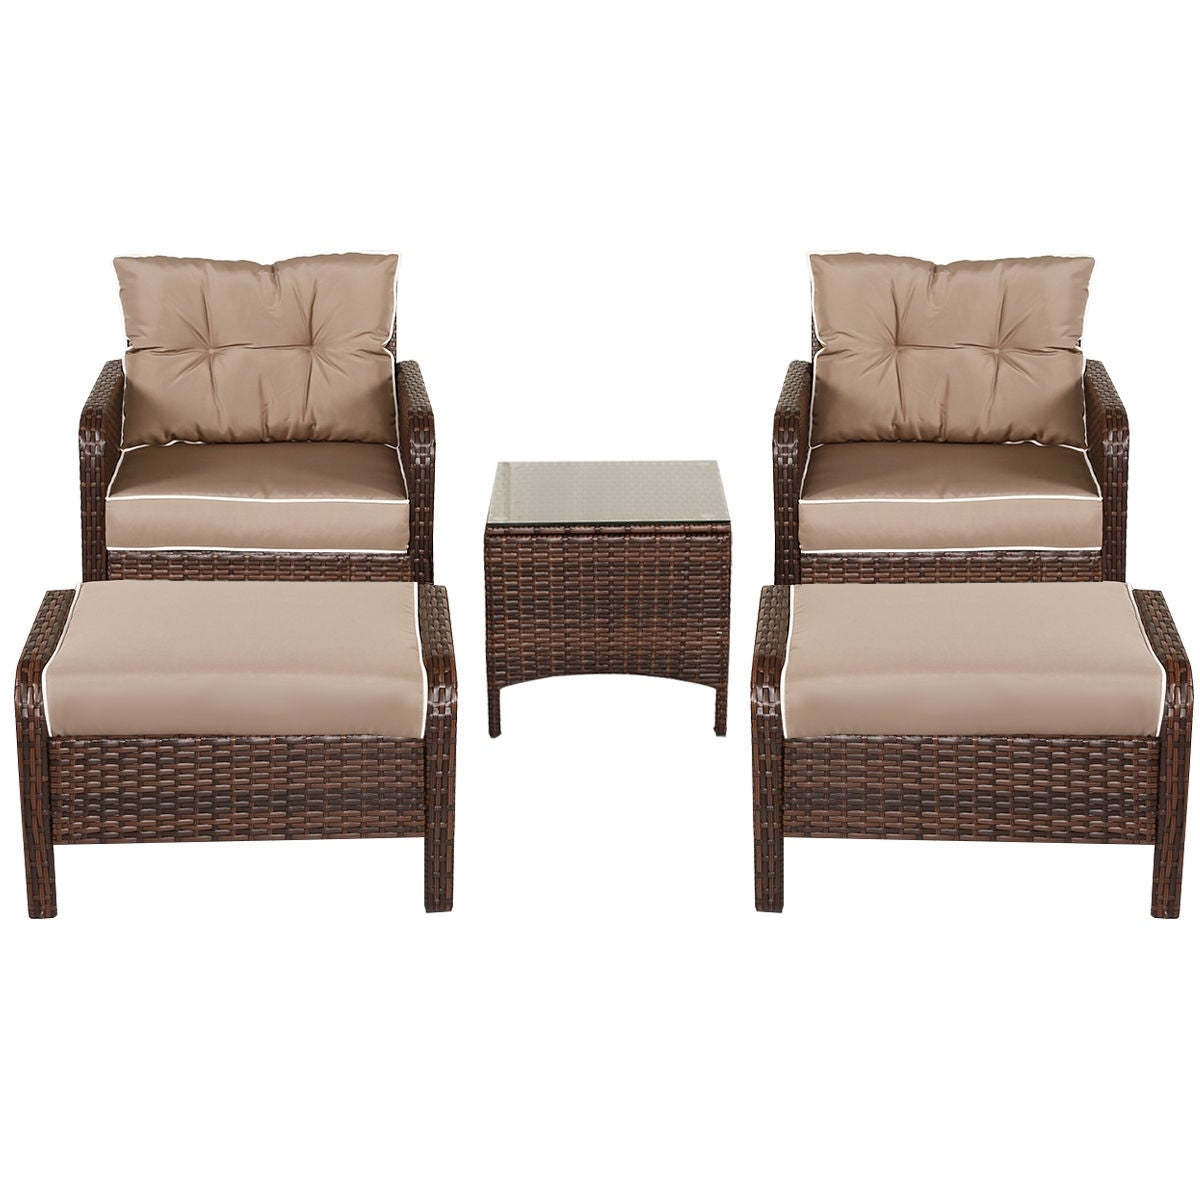 Costway 5 PCS Rattan Wicker Furniture Set Sofa Ottoman W/Brown Cushion  Patio Garden Yard   Free Shipping Today   Overstock   22839716